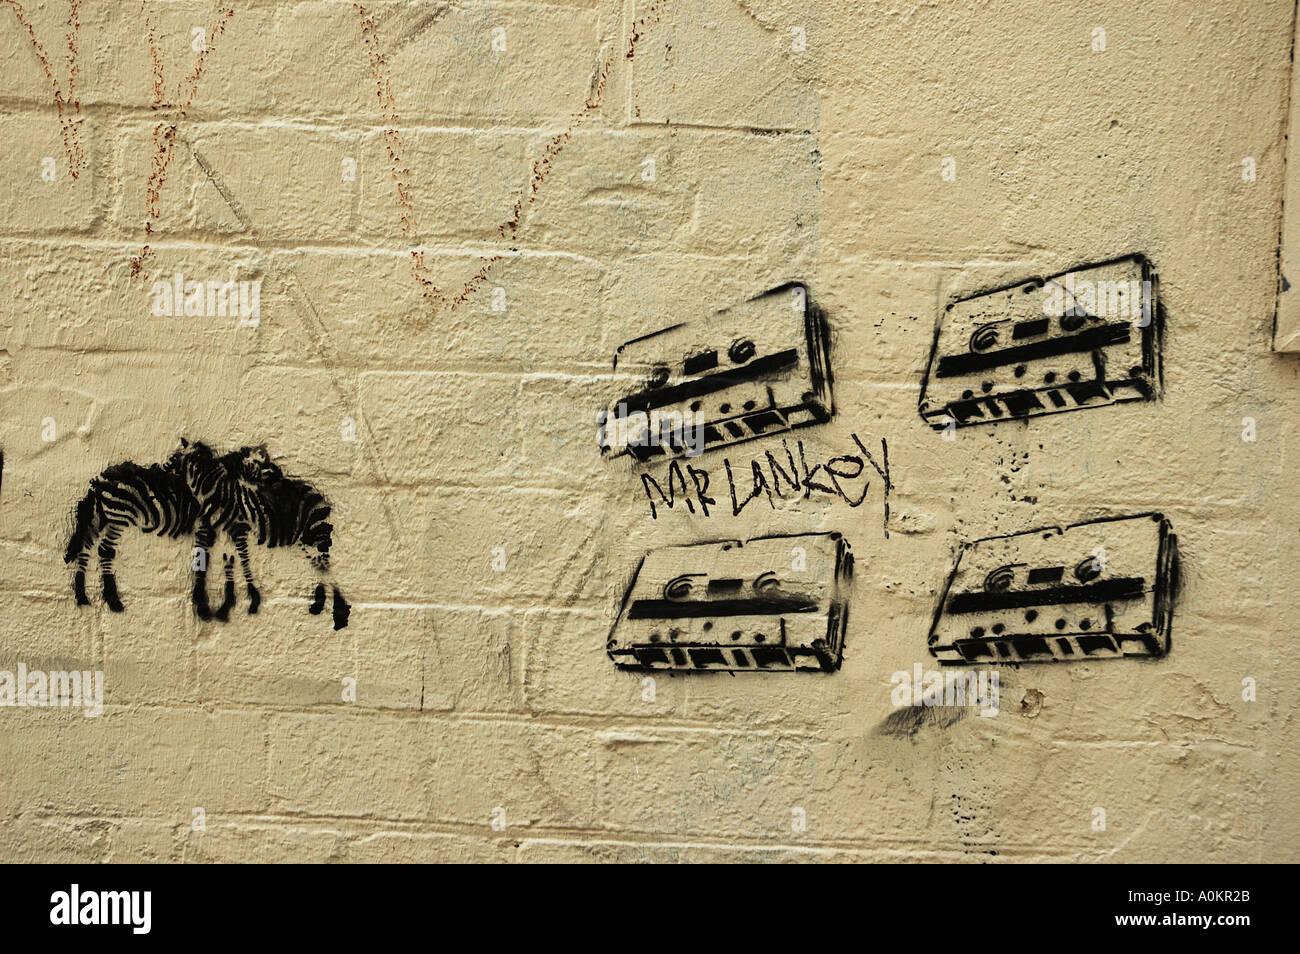 stencil art on urban wall street Brisbane Queensland Australia dsca ...